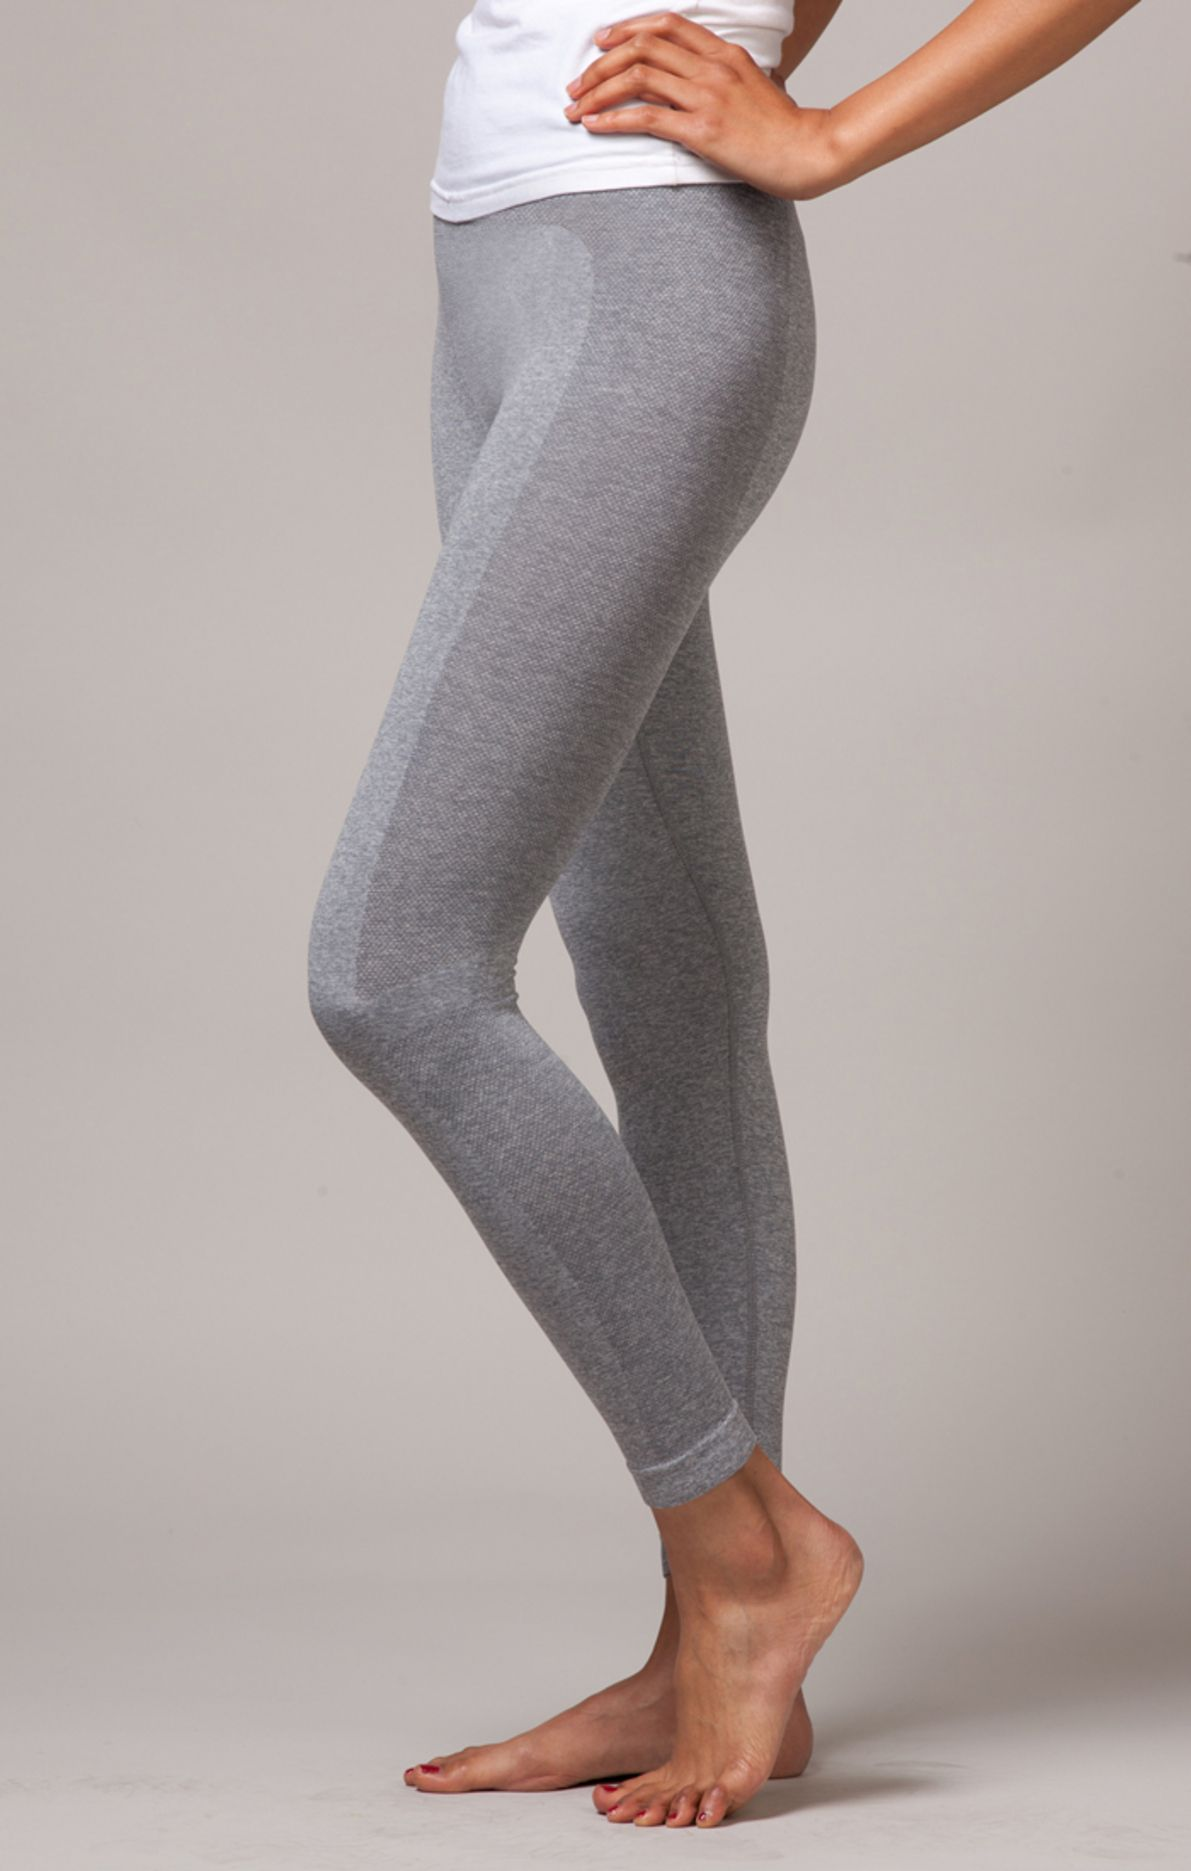 4a3fb06f35aea8 BLISS LEGGING gray legging, seamless leggings, hot yoga legging, fitness,  running, two tone #yoga #activewear #leggings ferastyle.com